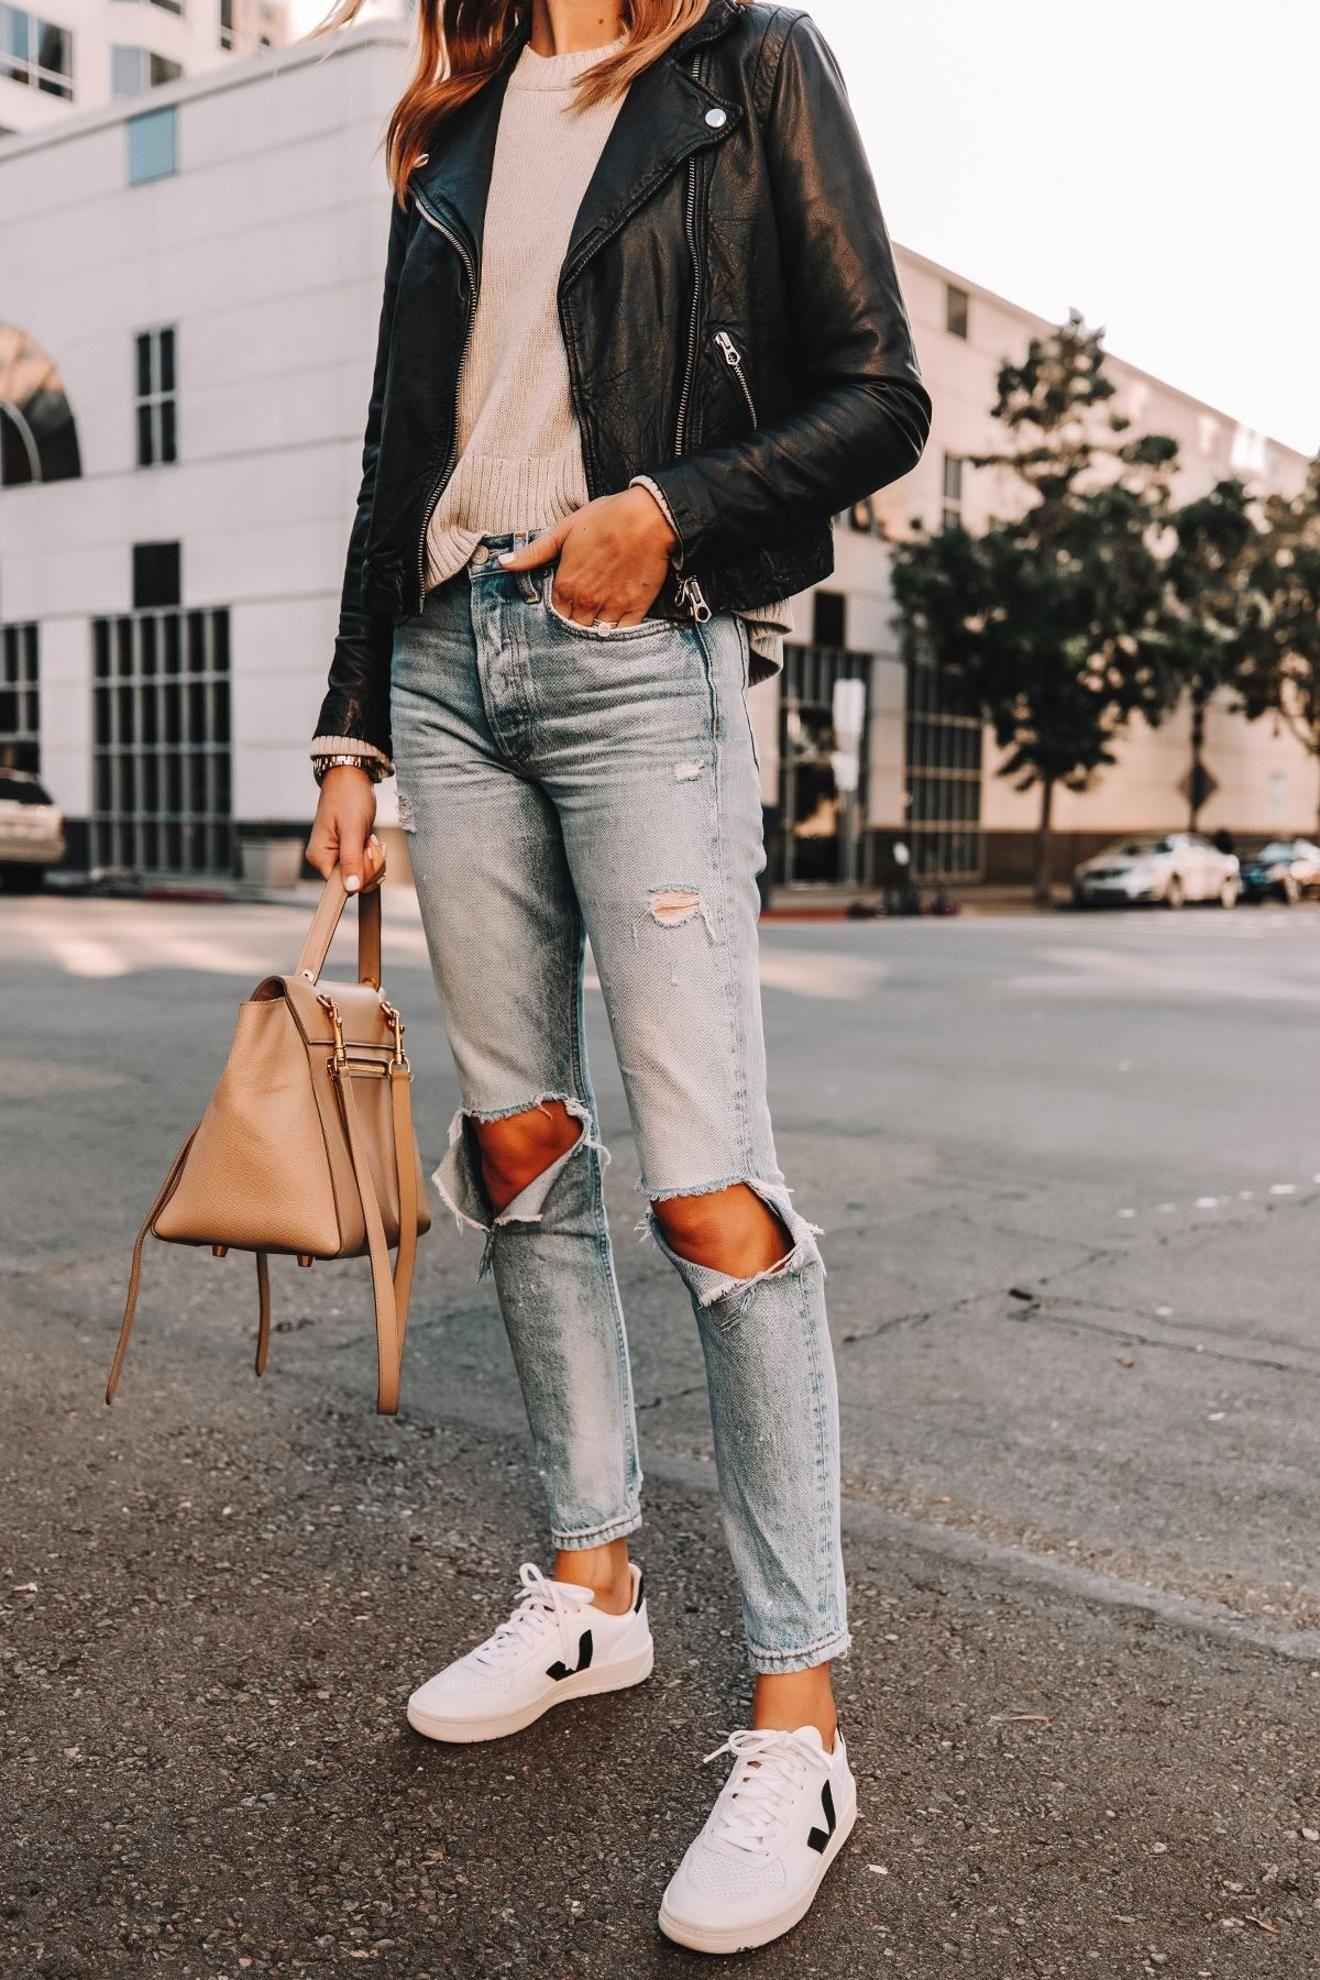 Fashion Jackson Wearing Madewell Black Leather Jacket Grey Sweater Boyish Ripped Jeans Black Leather Jacket Outfit Leather Jacket Style Womens Fashion Jackets [ 1980 x 1320 Pixel ]